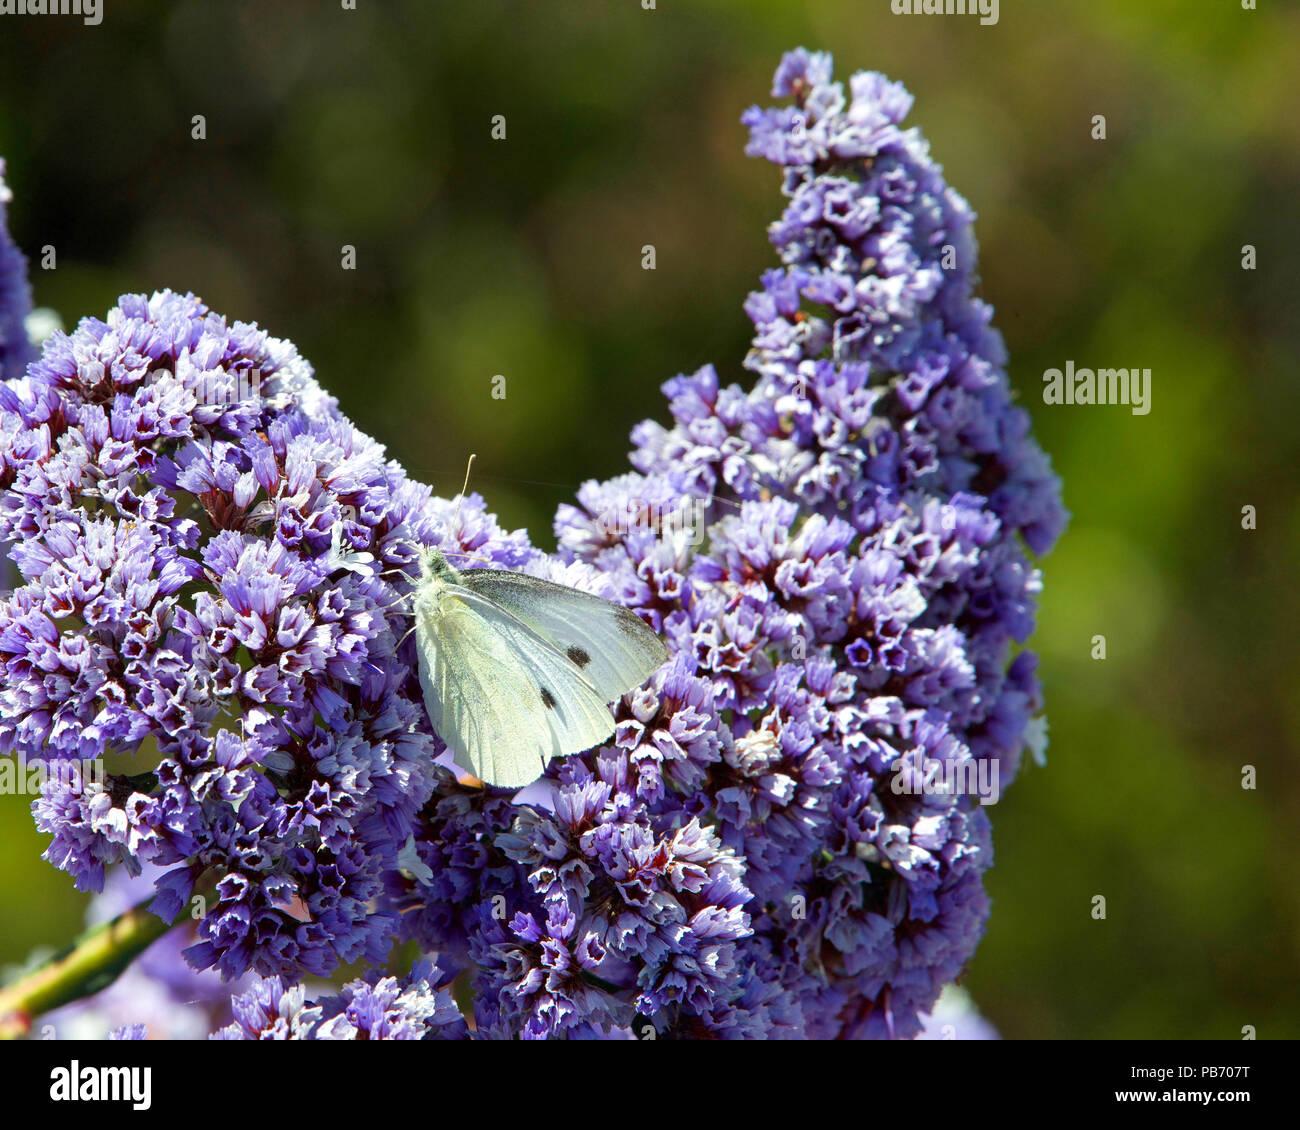 Cabbage white butterfly on purple ceanothus concha flowers on a cabbage white butterfly on purple ceanothus concha flowers on a sunny spring day mightylinksfo